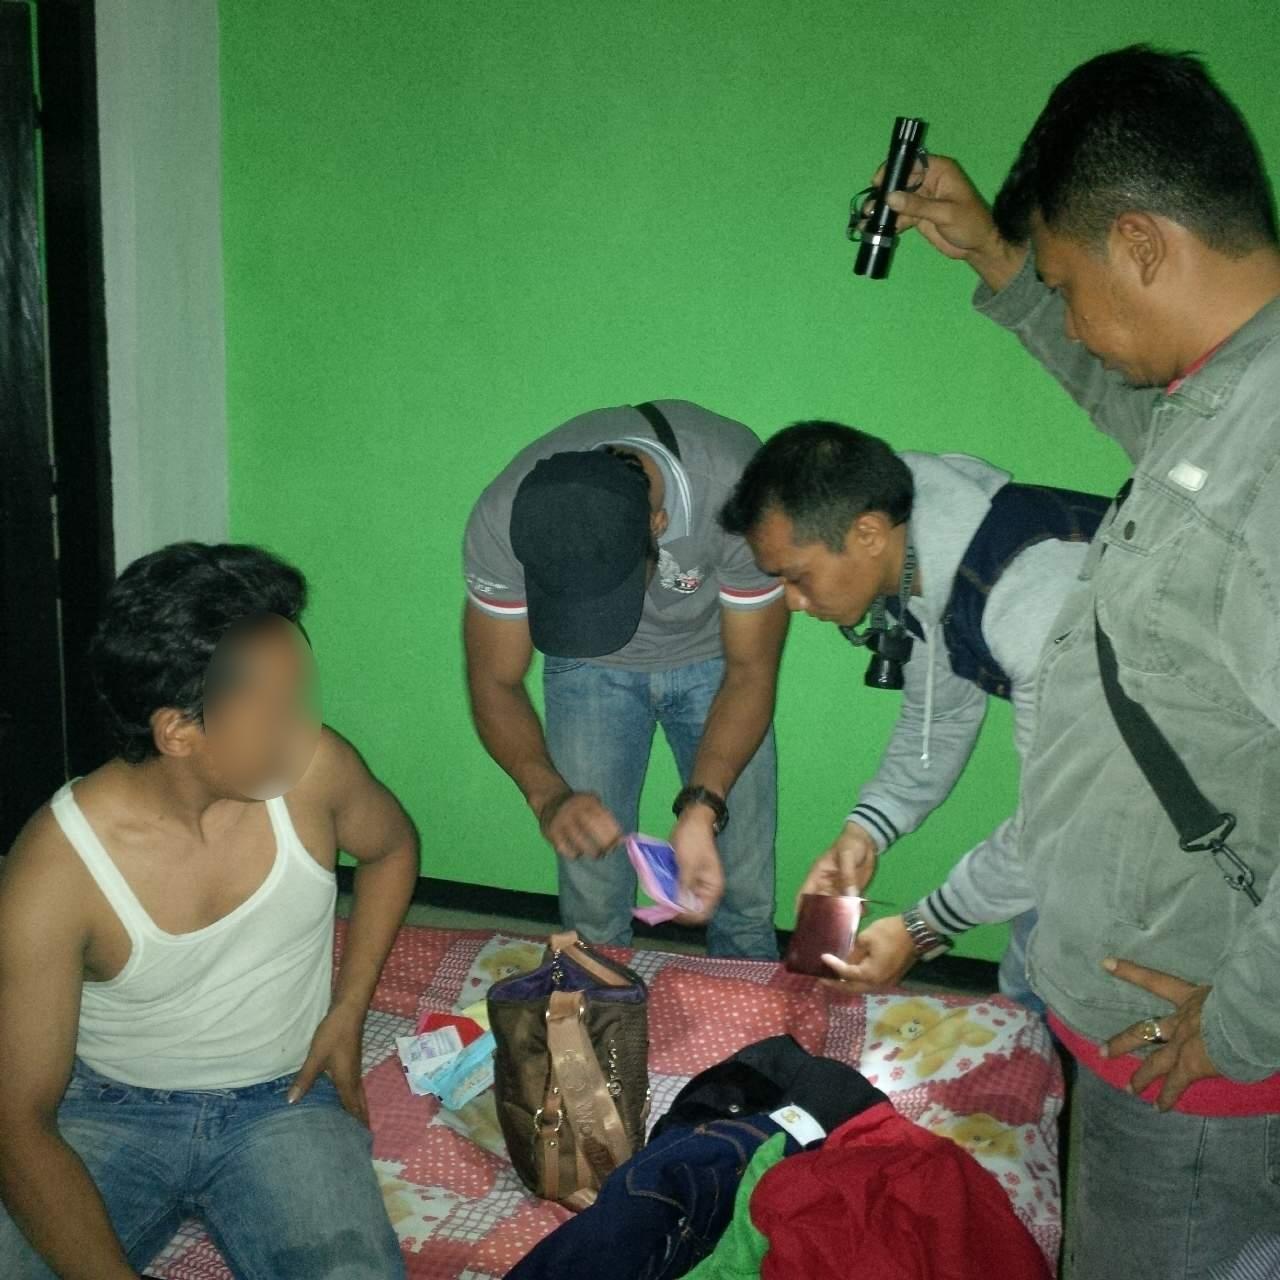 Sat Resnarkoba Geledah barang bawaan Pengunjung Hotel